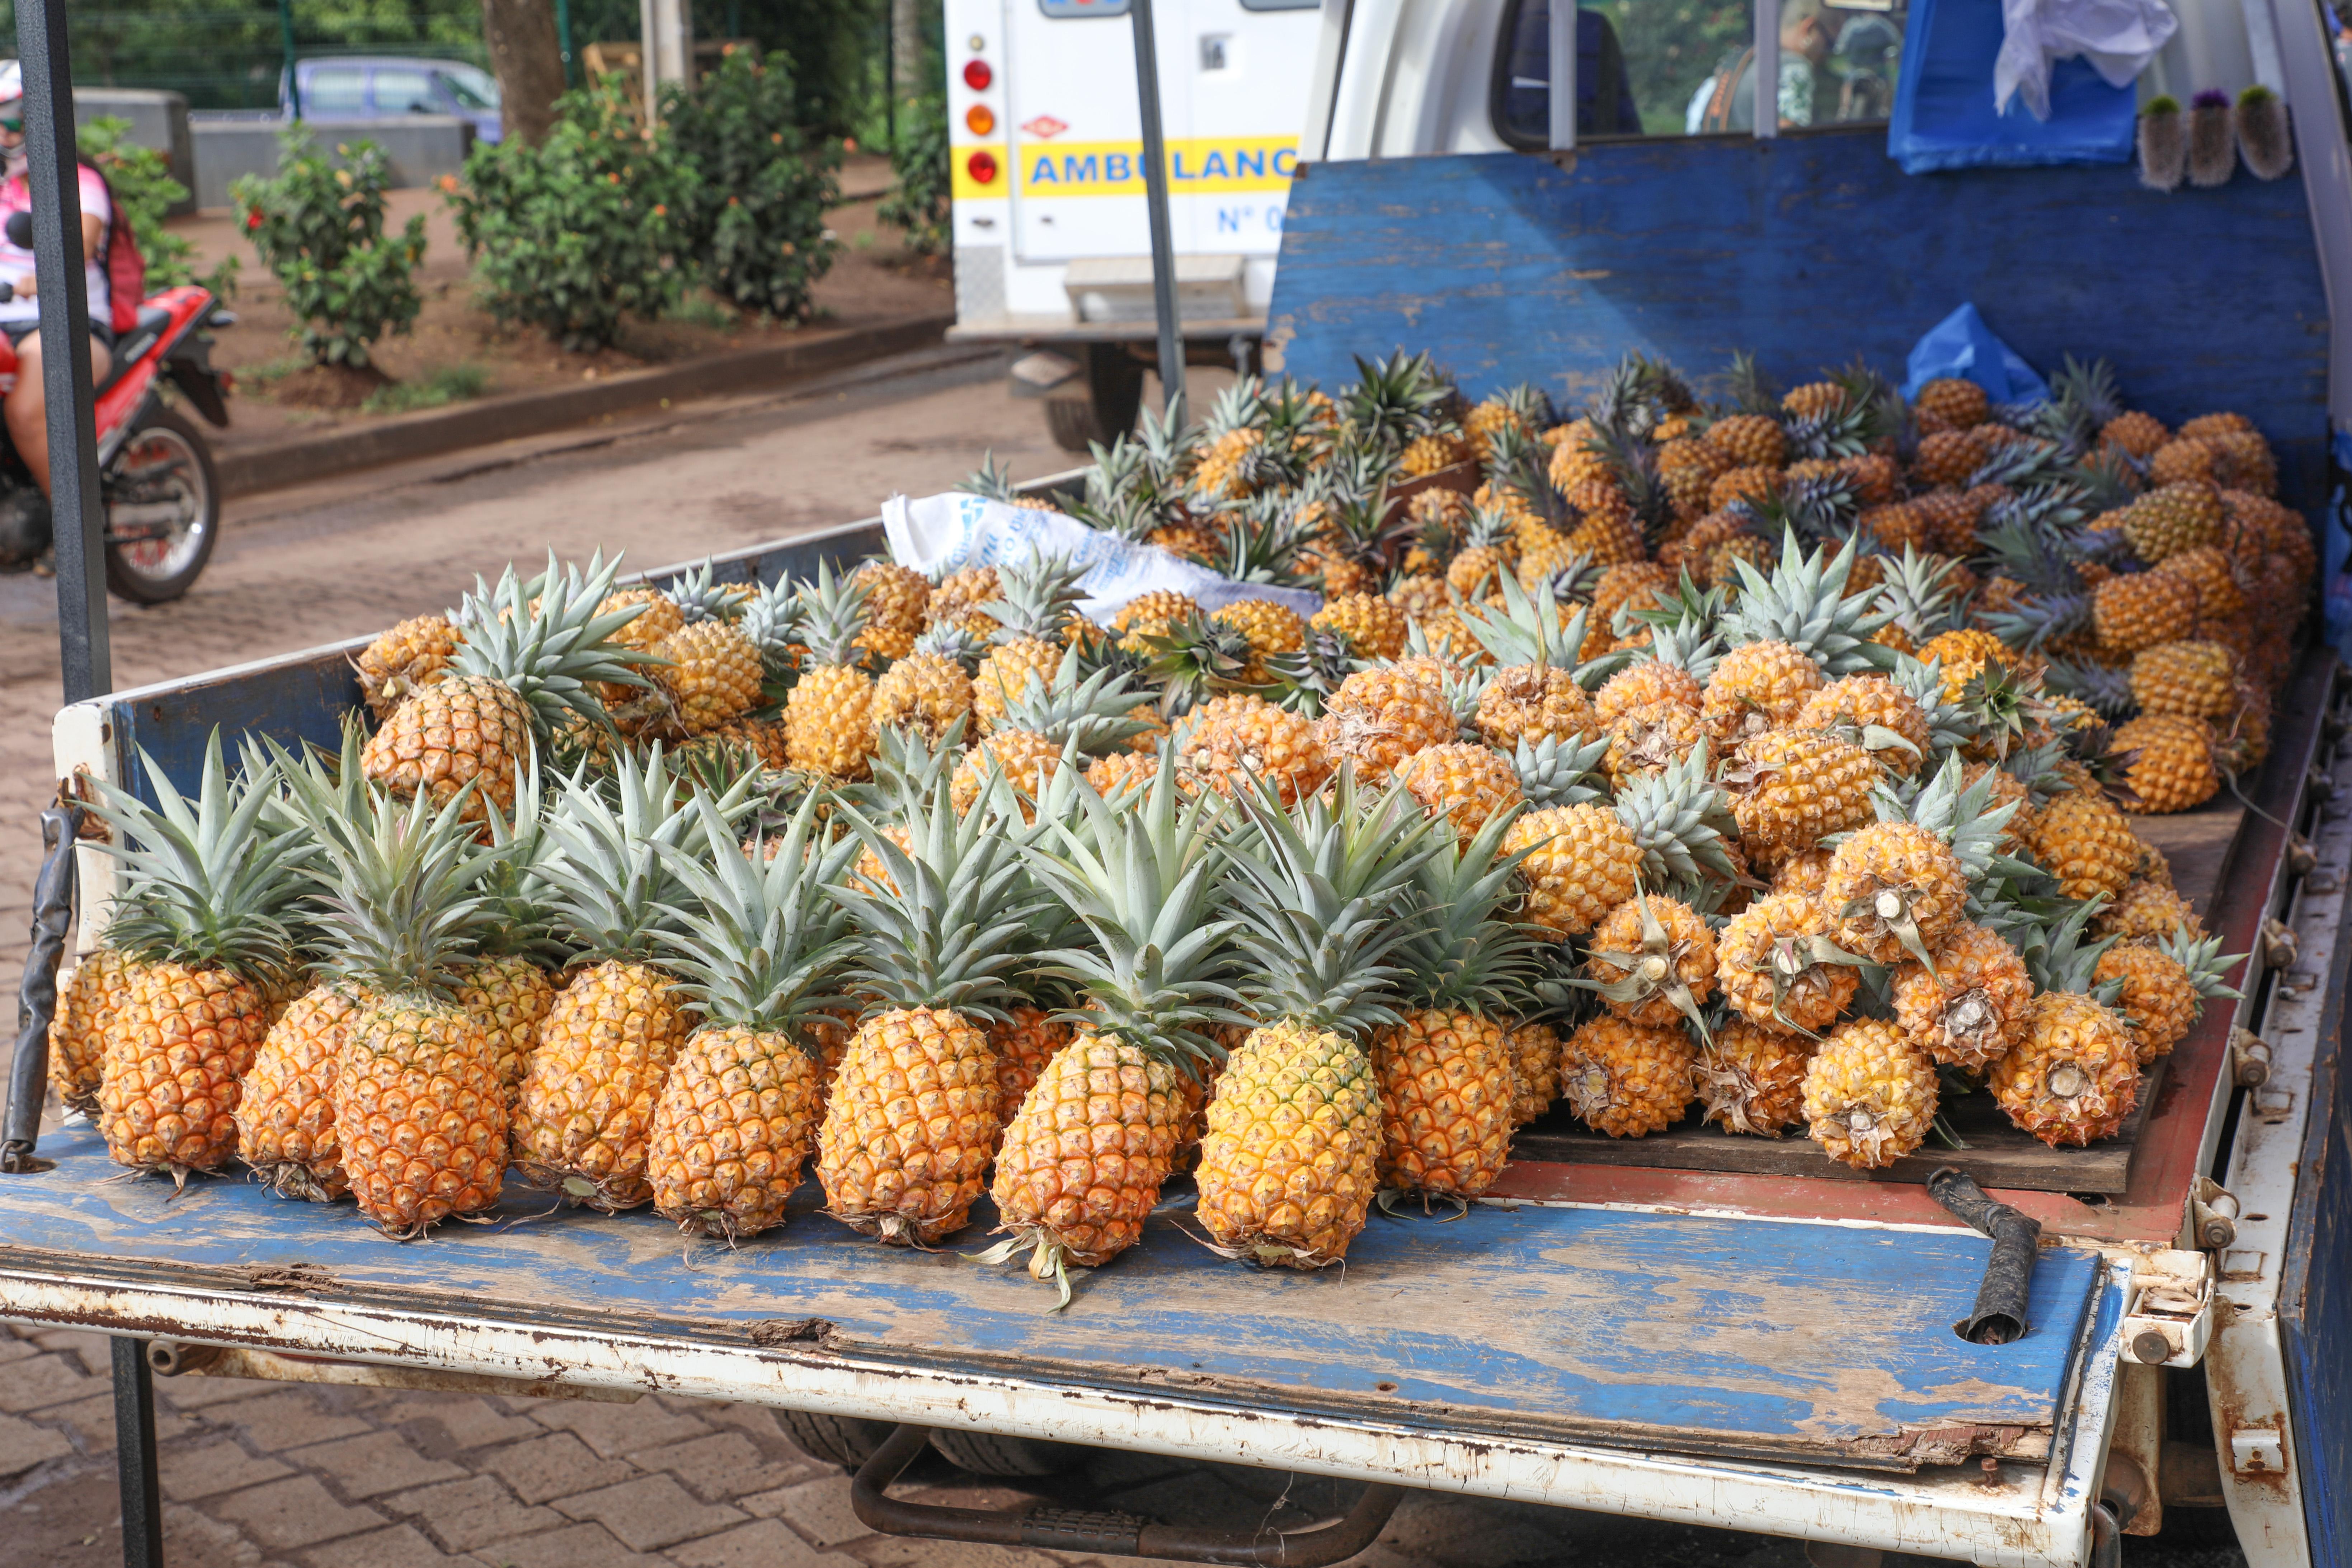 Ananasverkoop in Atumu Tekena